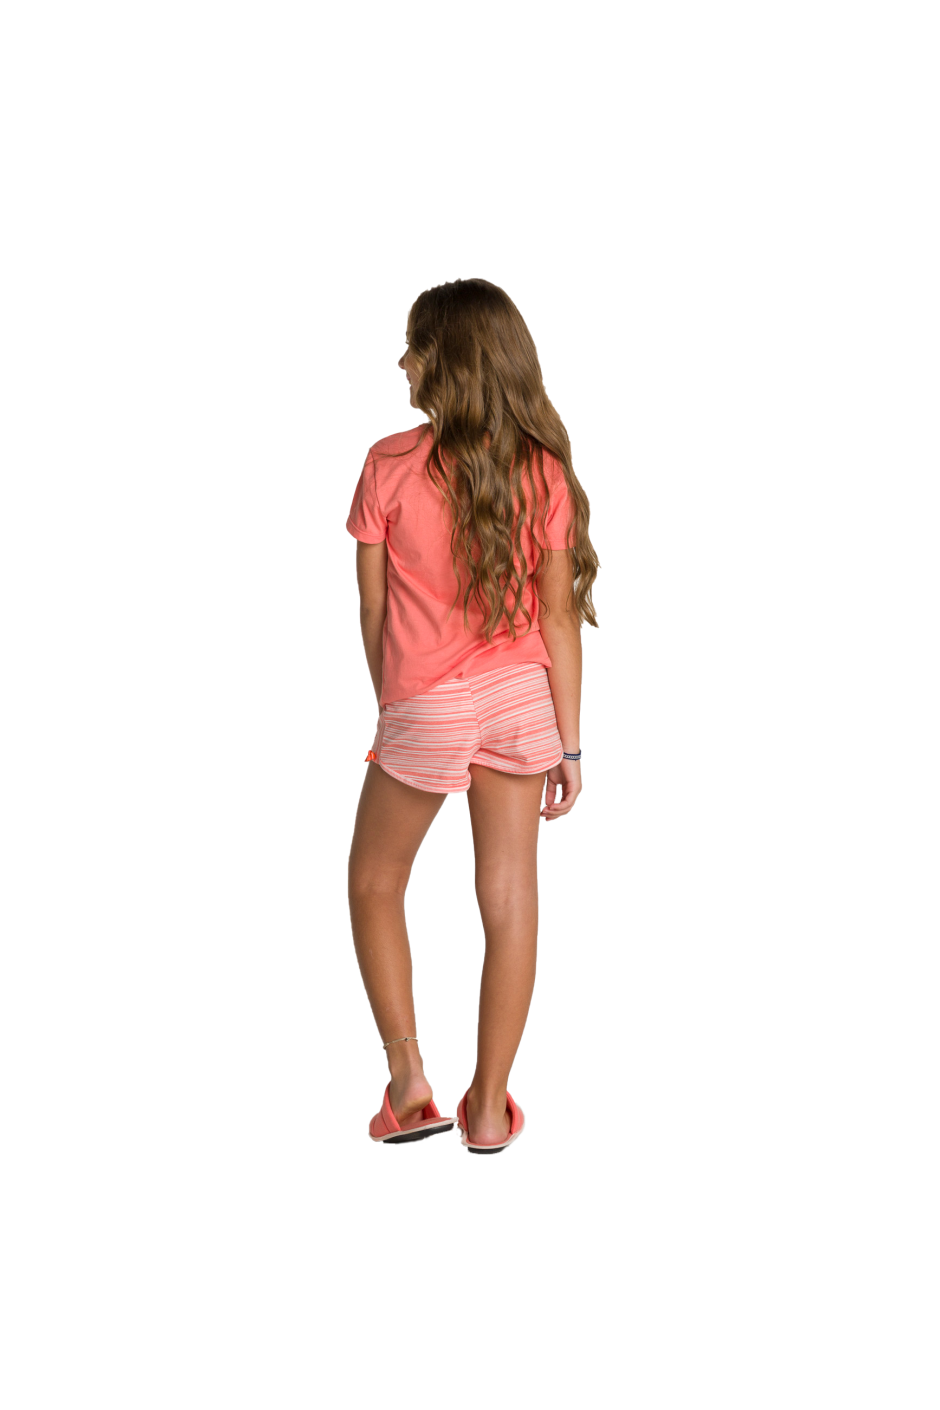 011/B - Short Doll Juvenil Feminino Bonjour - Estampa Perolada